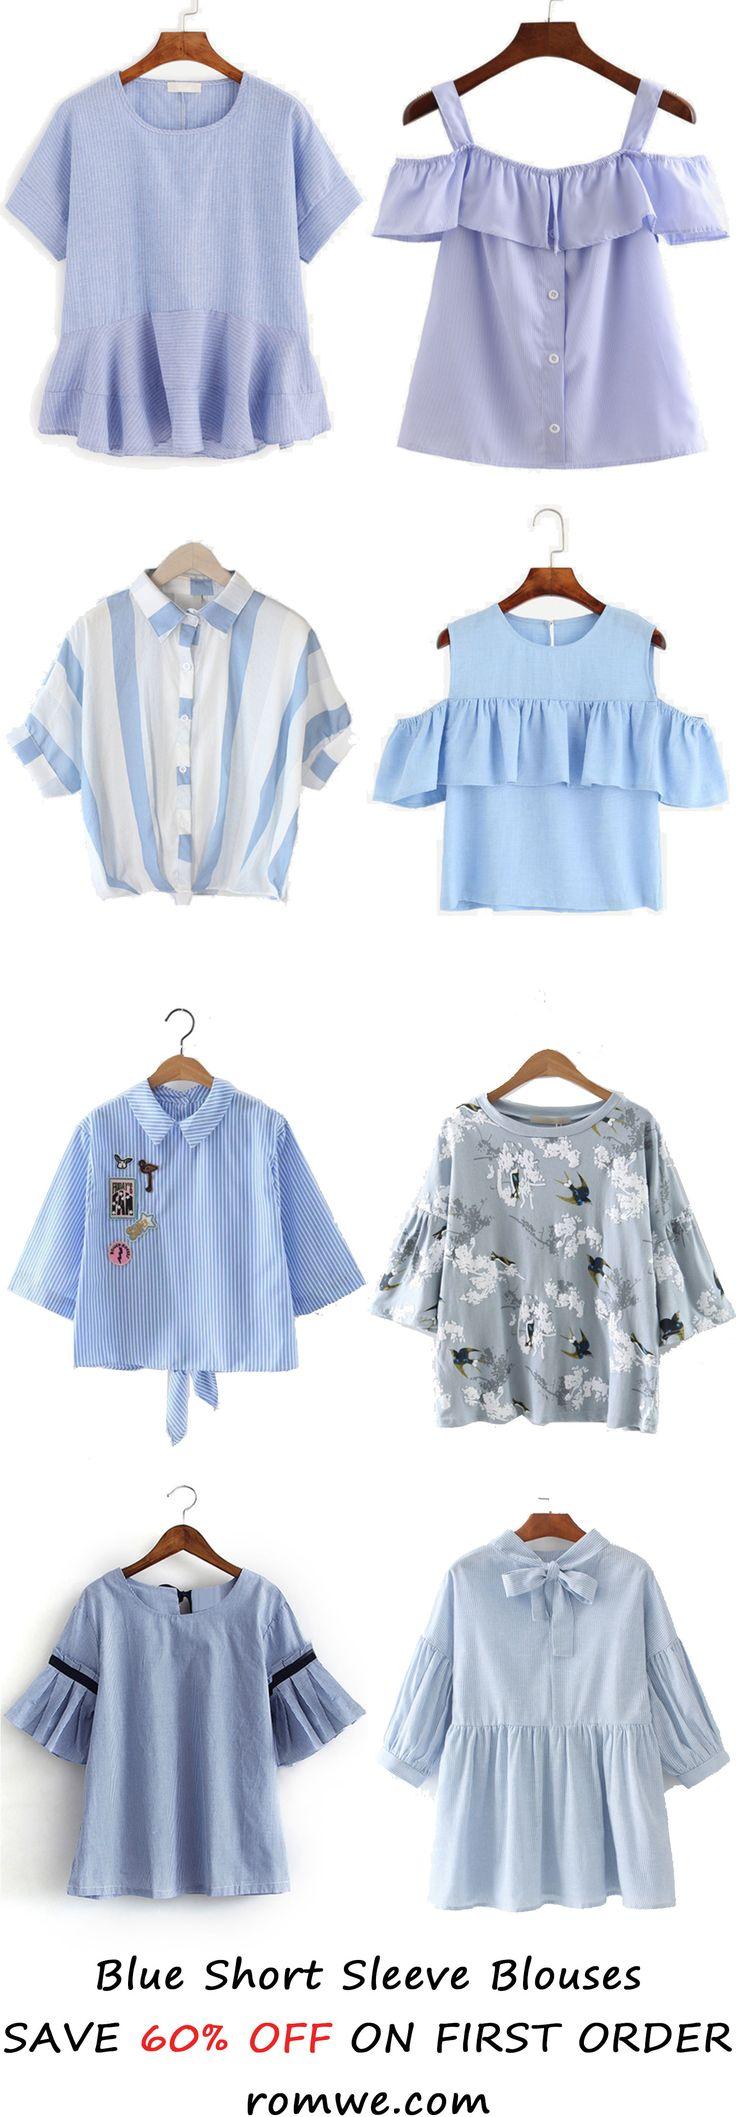 Blue Short Sleeve Blouses 2017 from romwe.com